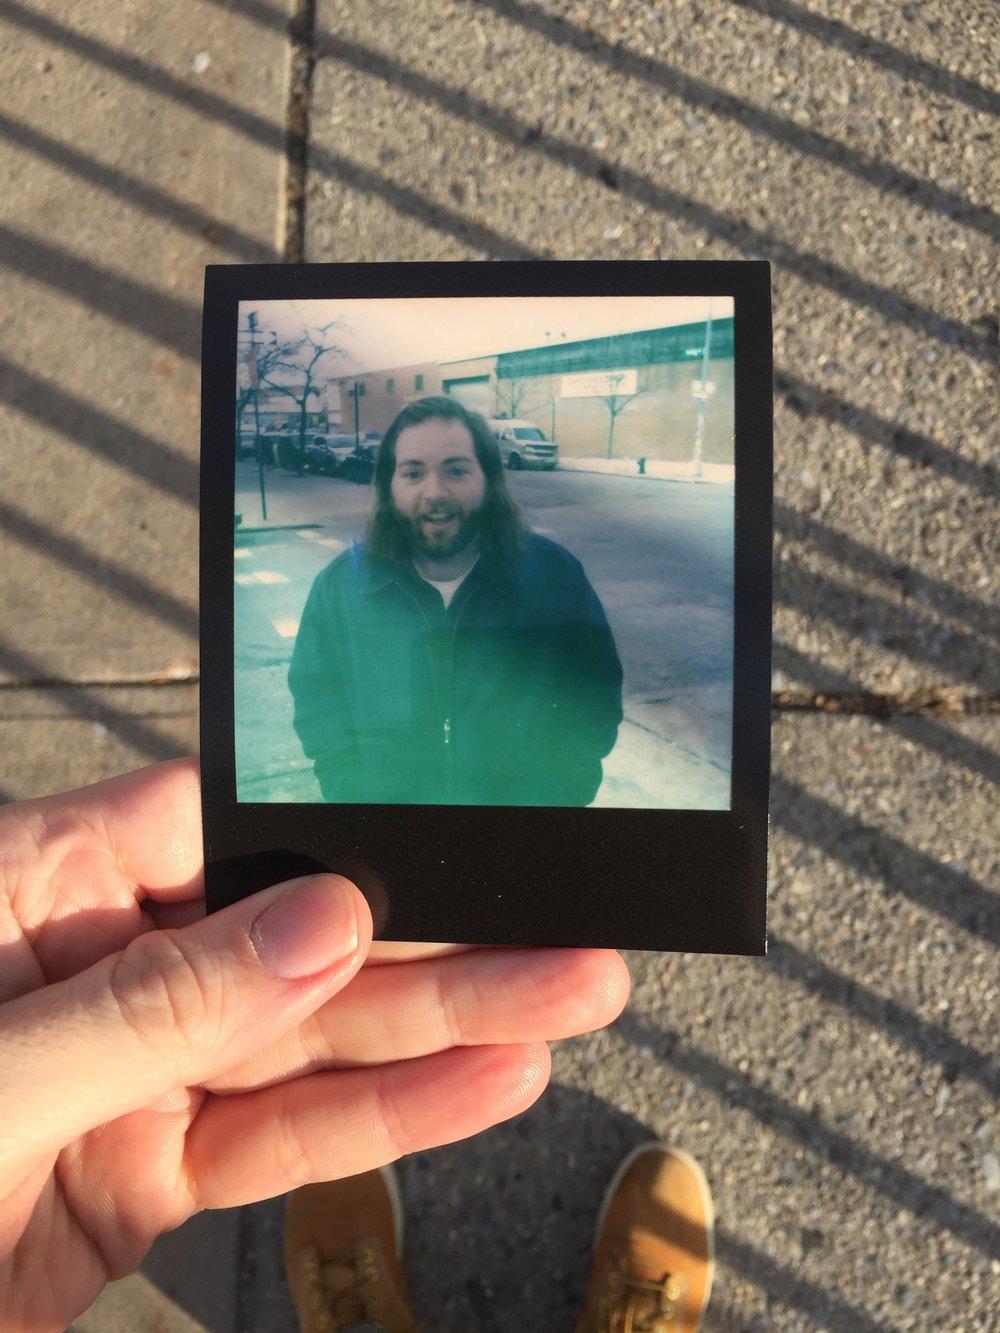 Phil-Polaroid.jpg